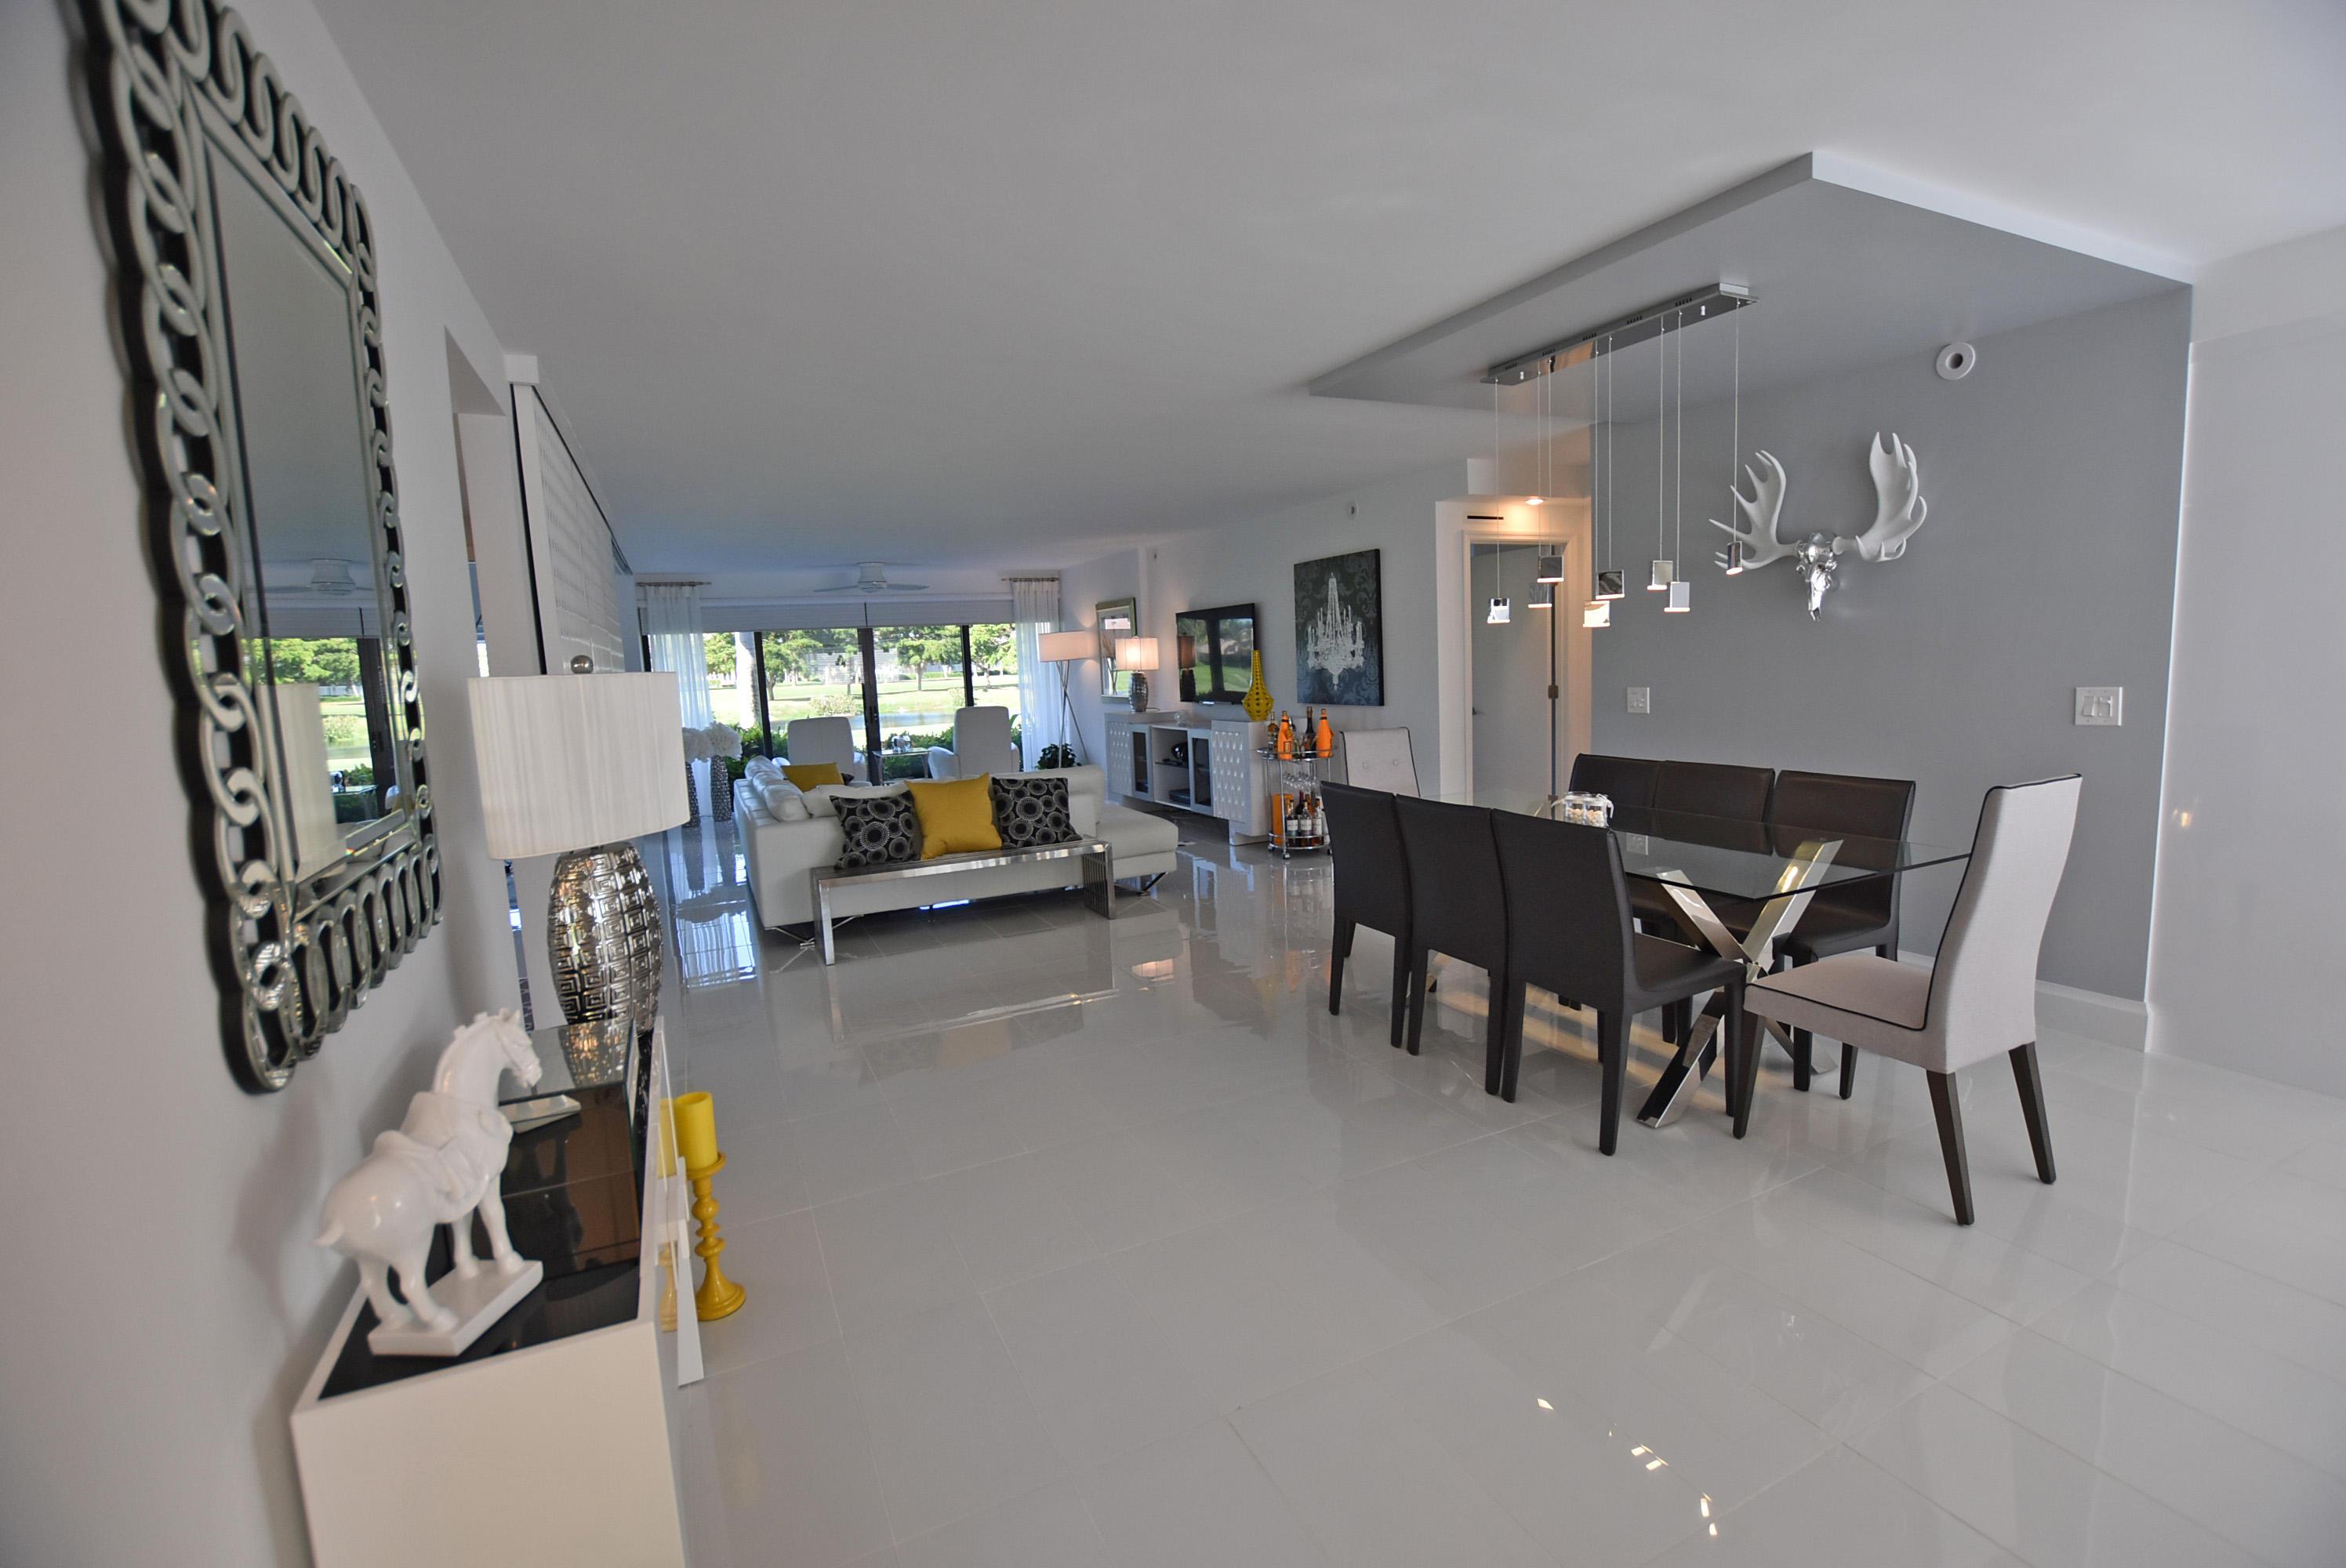 10869 Quail Covey Road, Boynton Beach, Florida 33436, 3 Bedrooms Bedrooms, ,2 BathroomsBathrooms,Condo/Coop,For Sale,Azalea,Quail Covey,1,RX-10386210